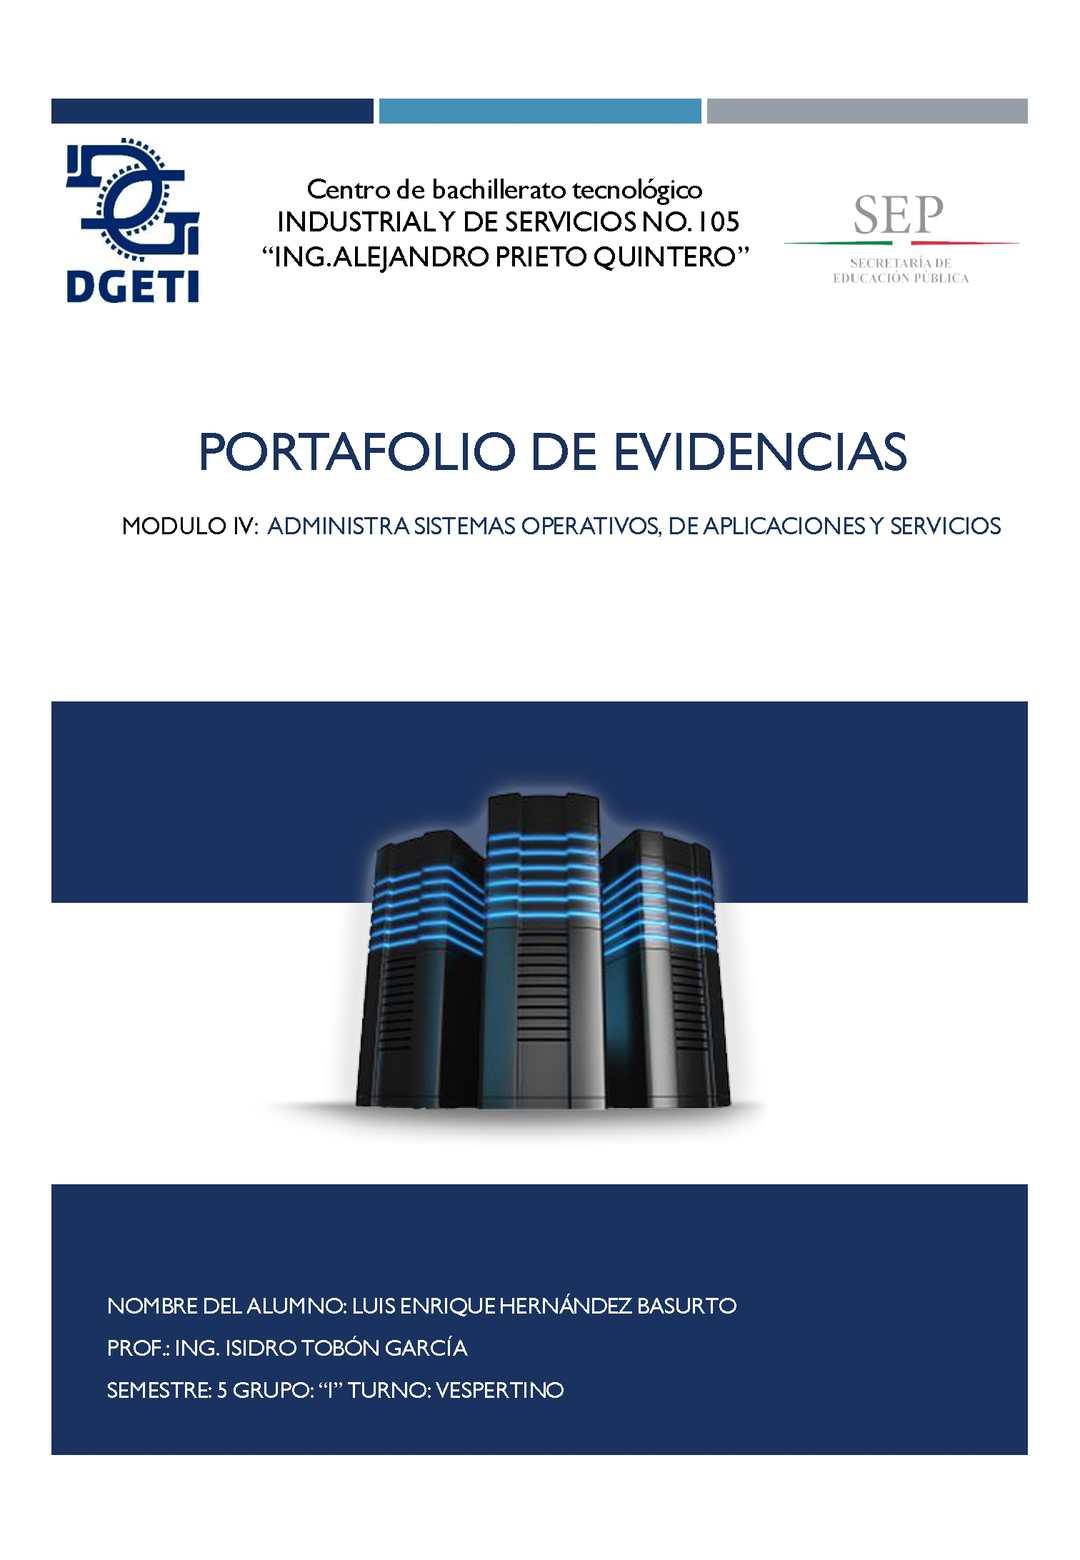 Portafolio de Evidencias Enrique Basurto